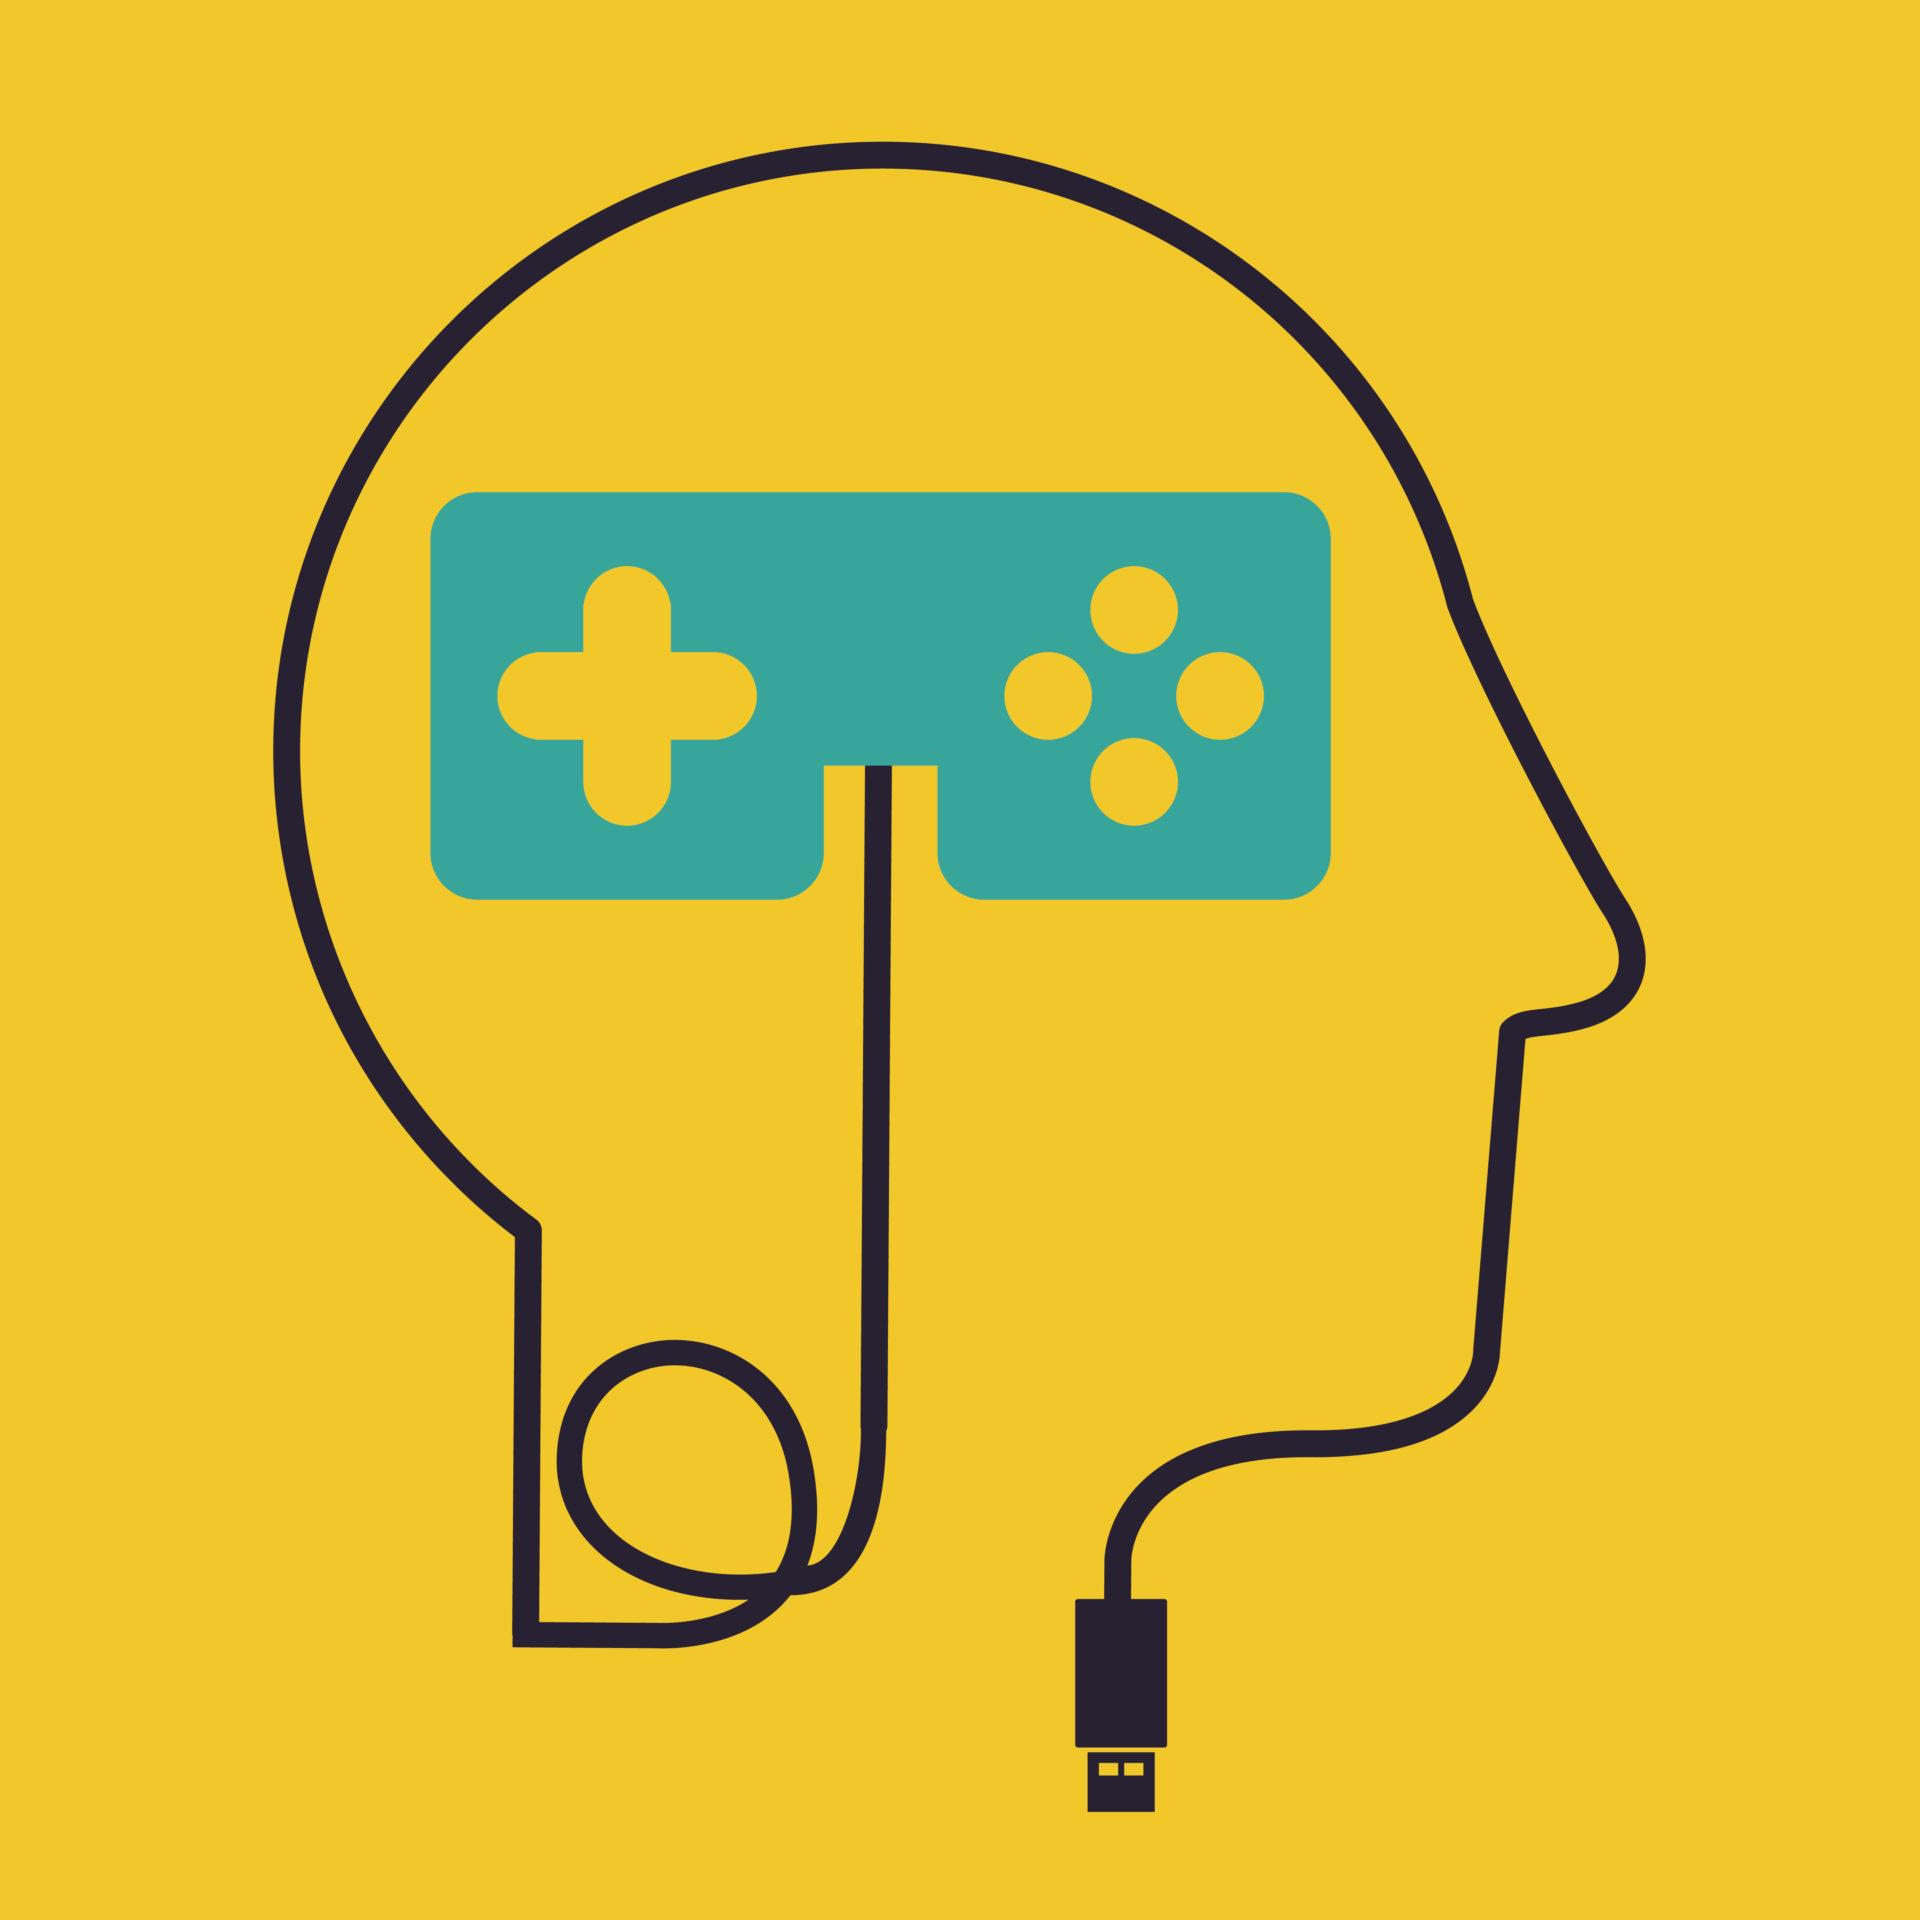 Spiele FГјrs Gehirn